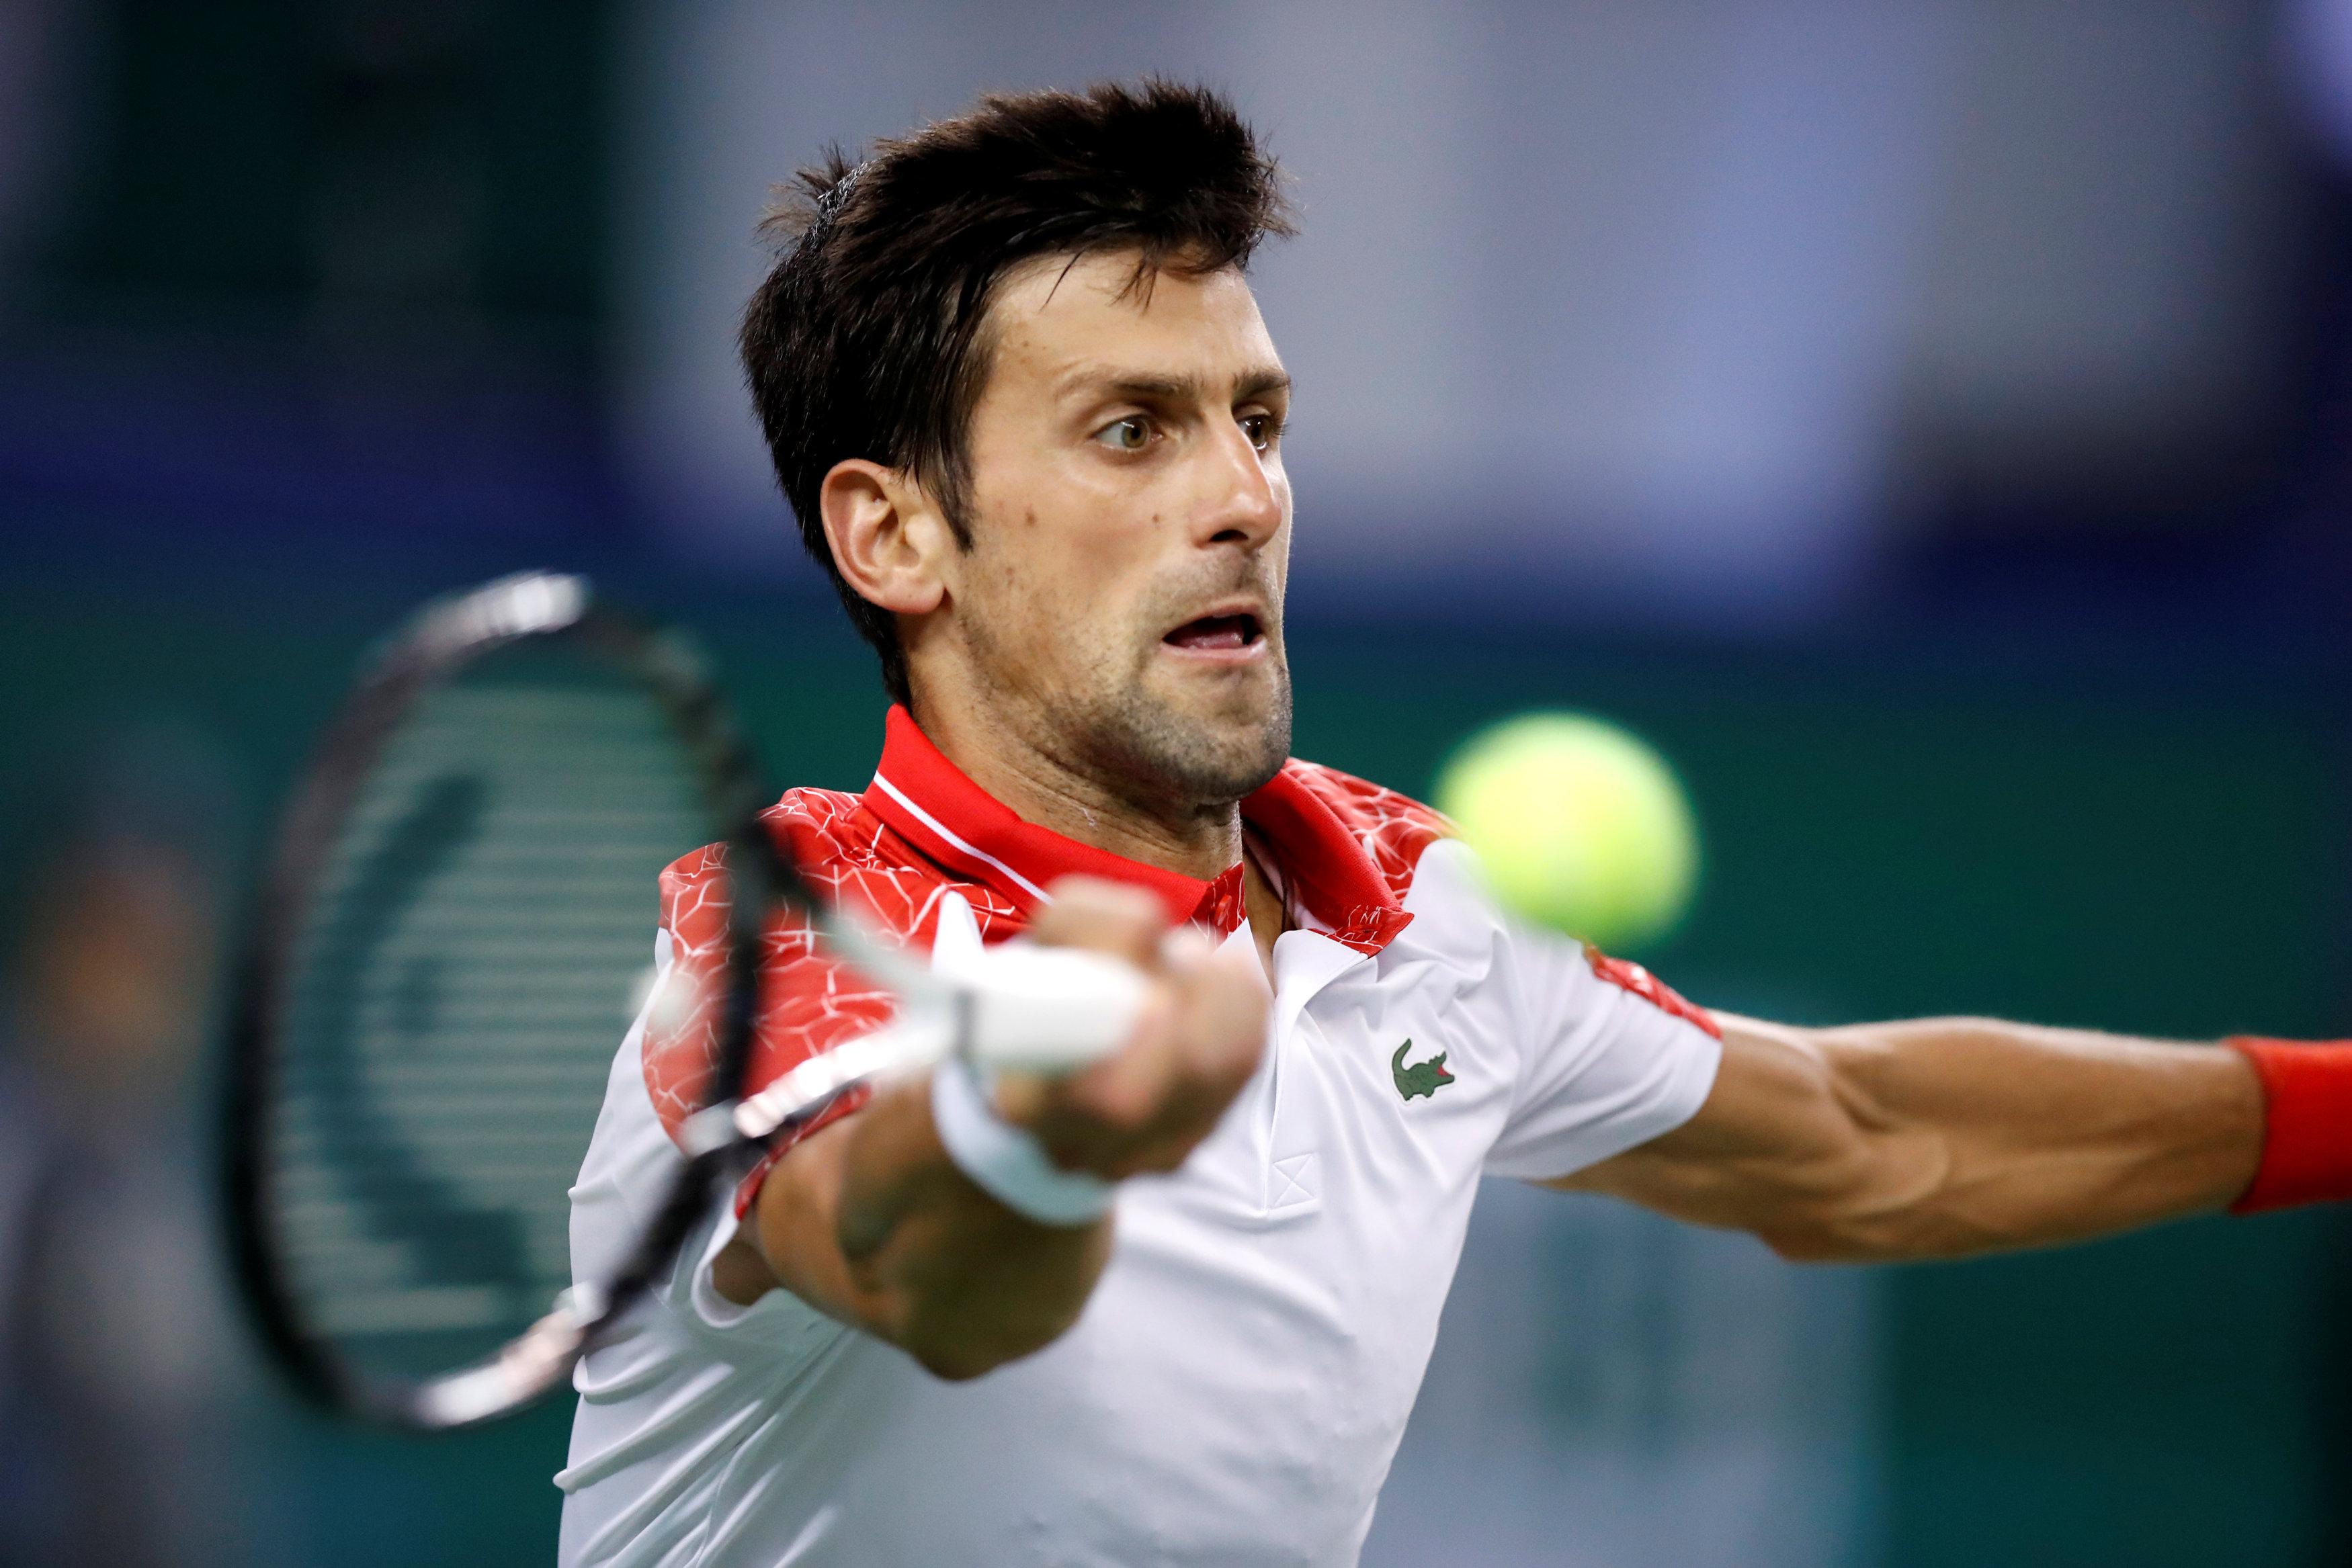 Tennis: Djokovic makes winning return in Shanghai